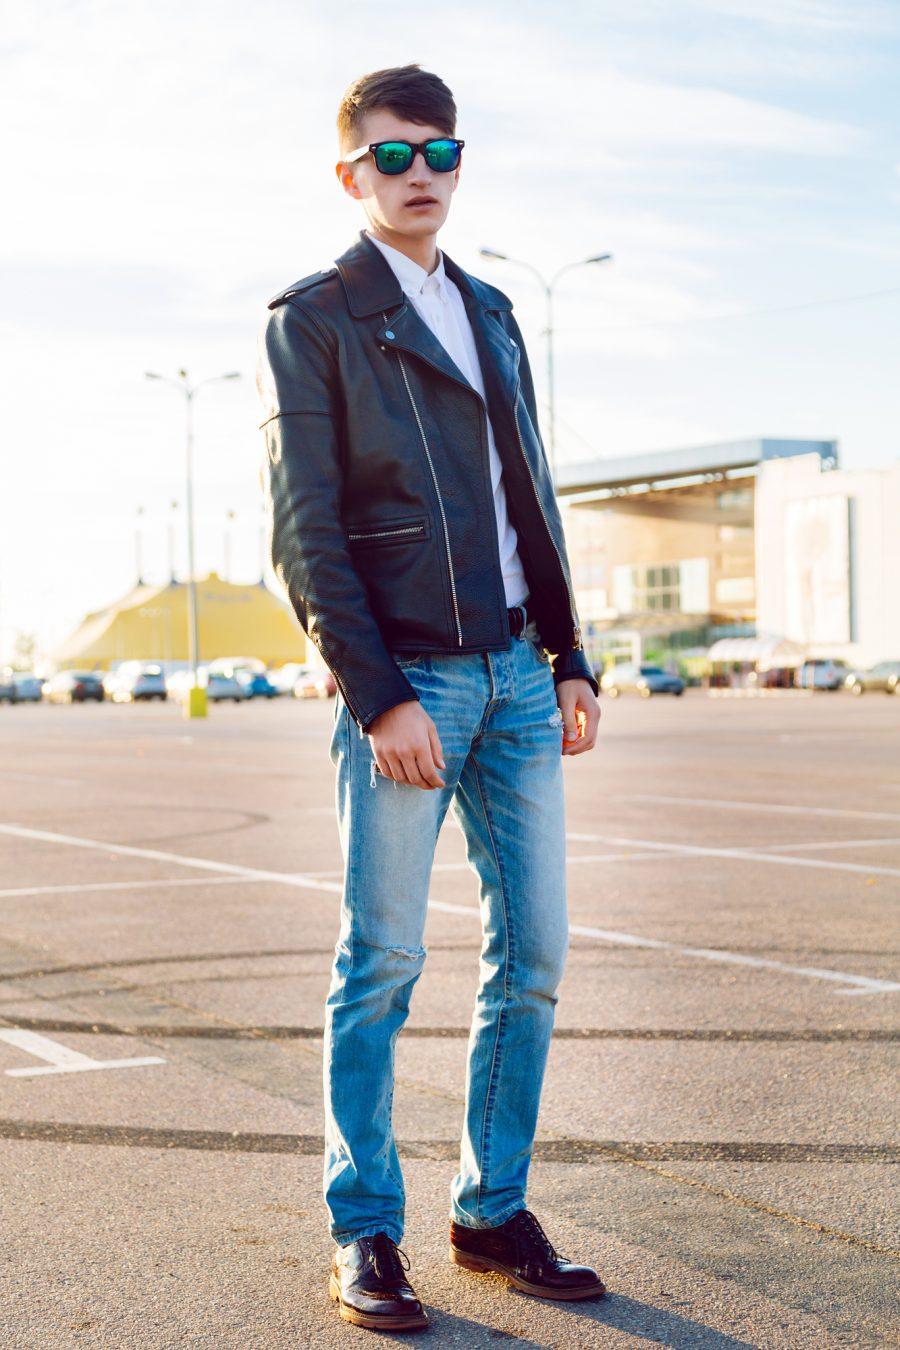 Stylish Man Leather Jacket Skinny Jeans